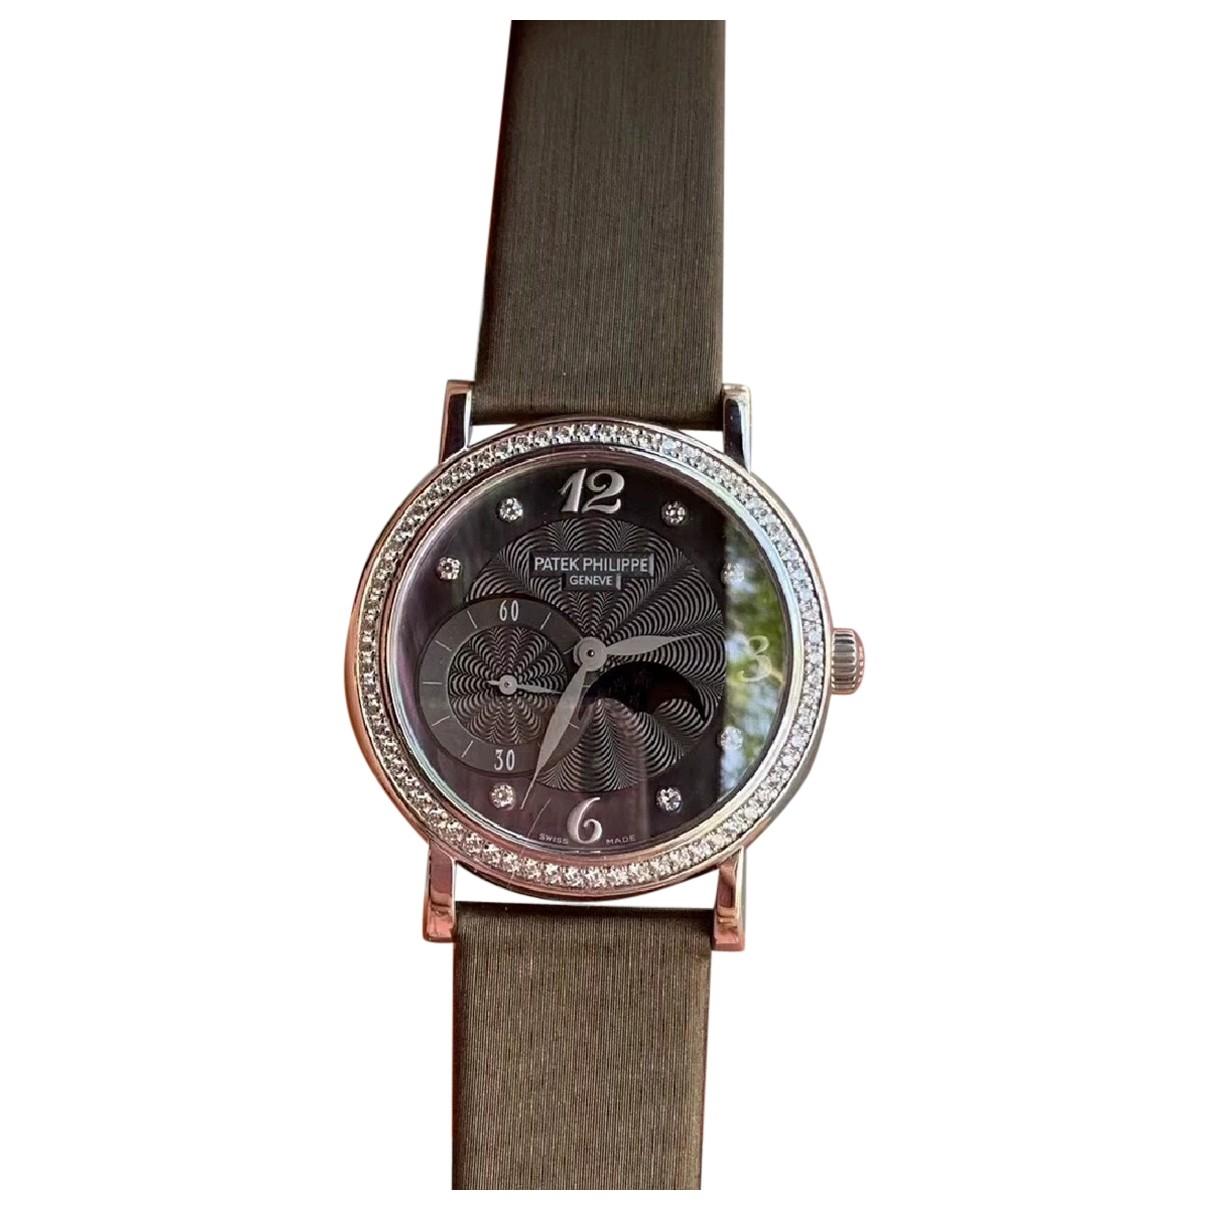 Patek Philippe \N White gold watch for Women \N